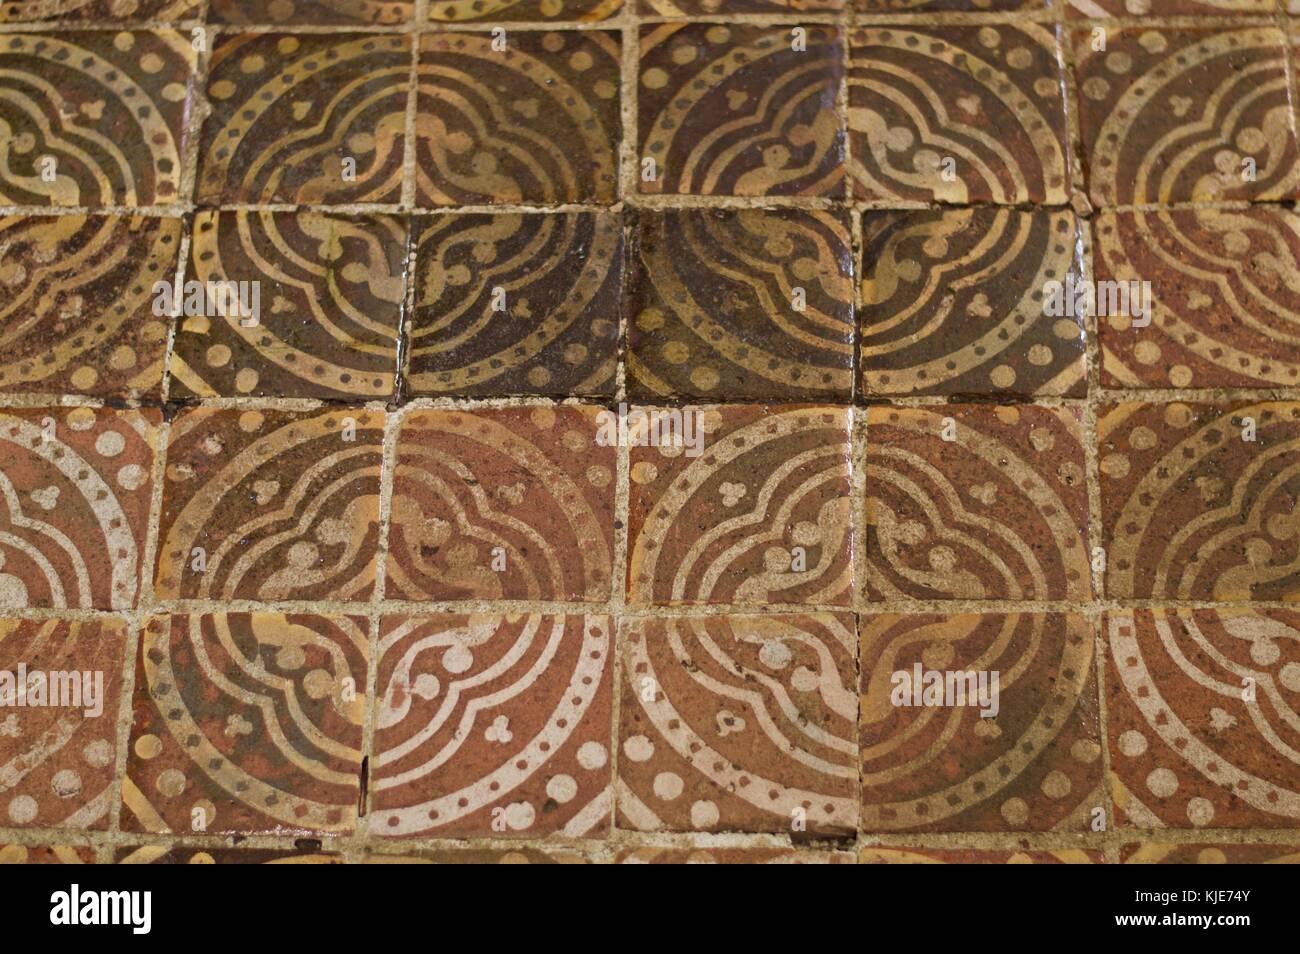 Roman floor tiles stock photos roman floor tiles stock images alamy original roman mosaic tiles on floor of winchester cathedral uk stock image dailygadgetfo Image collections